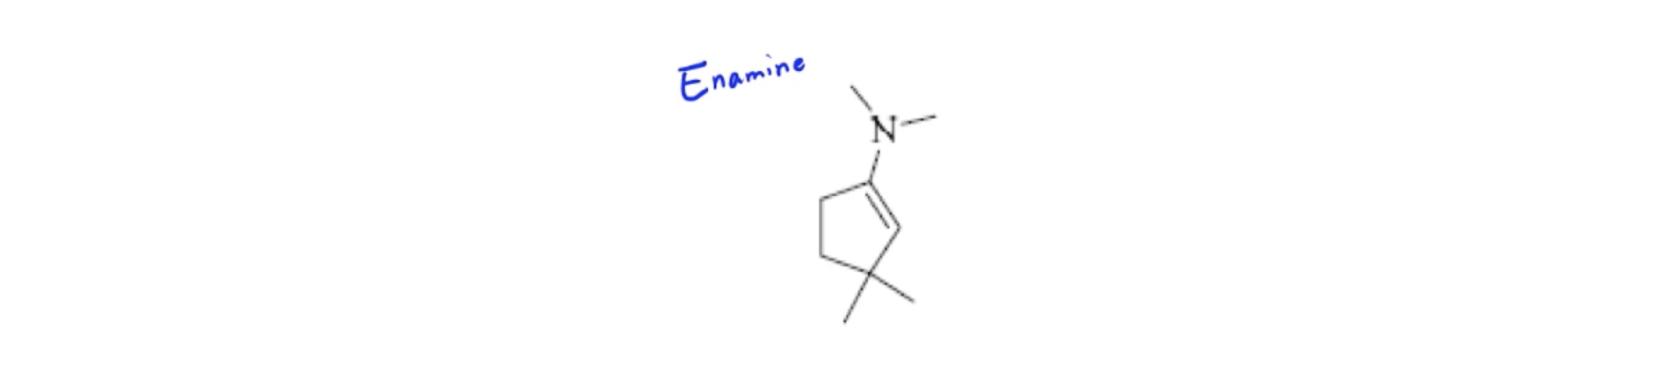 Enamine-Structure